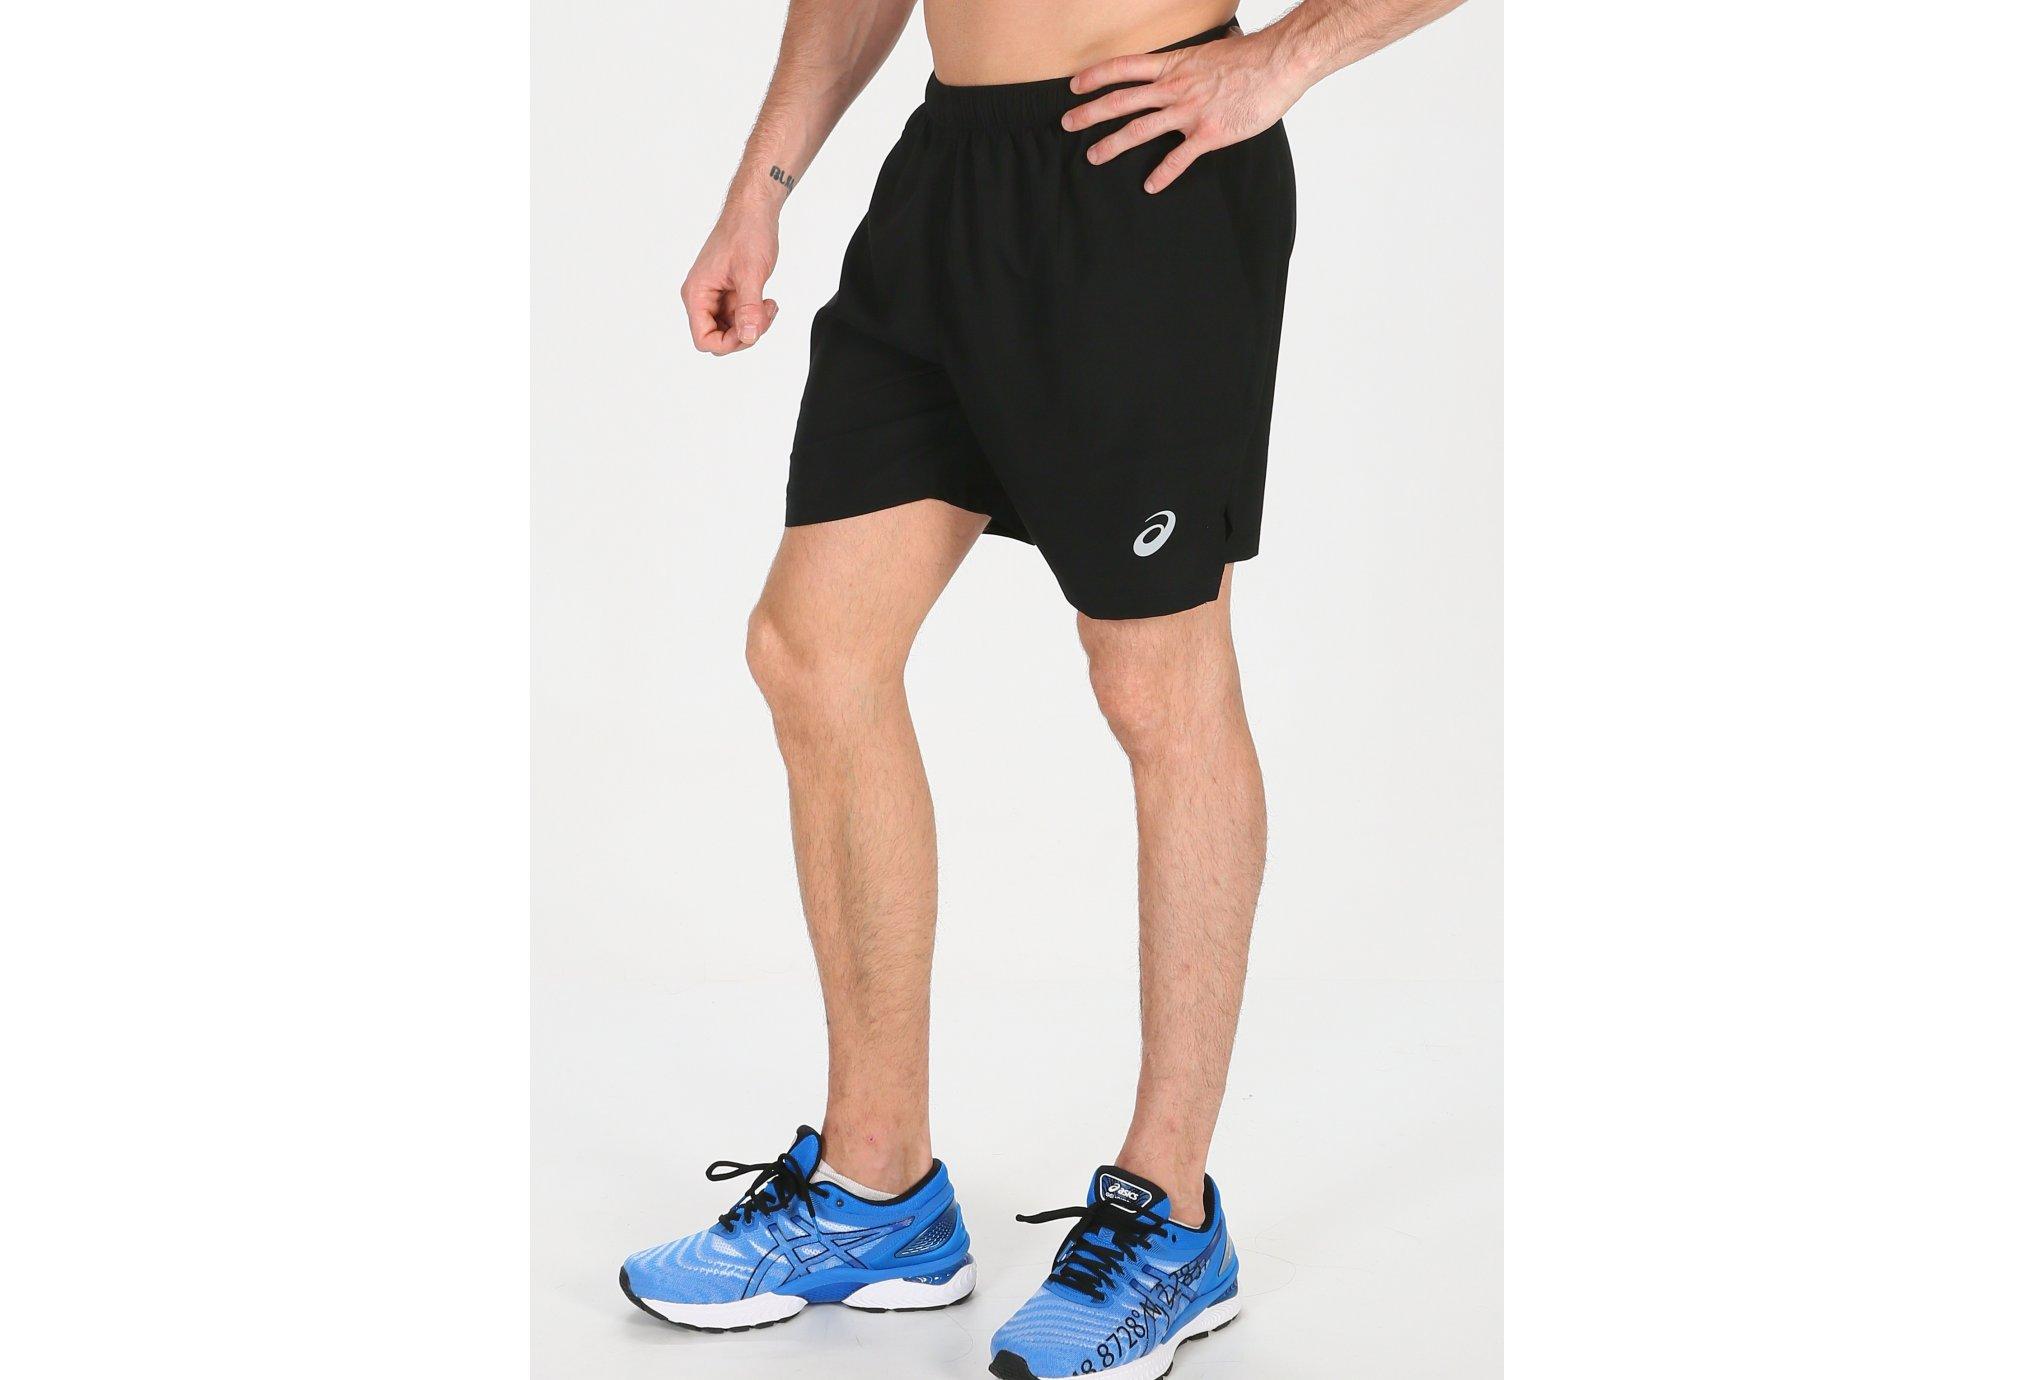 Asics Silver 2 en 1 M vêtement running homme